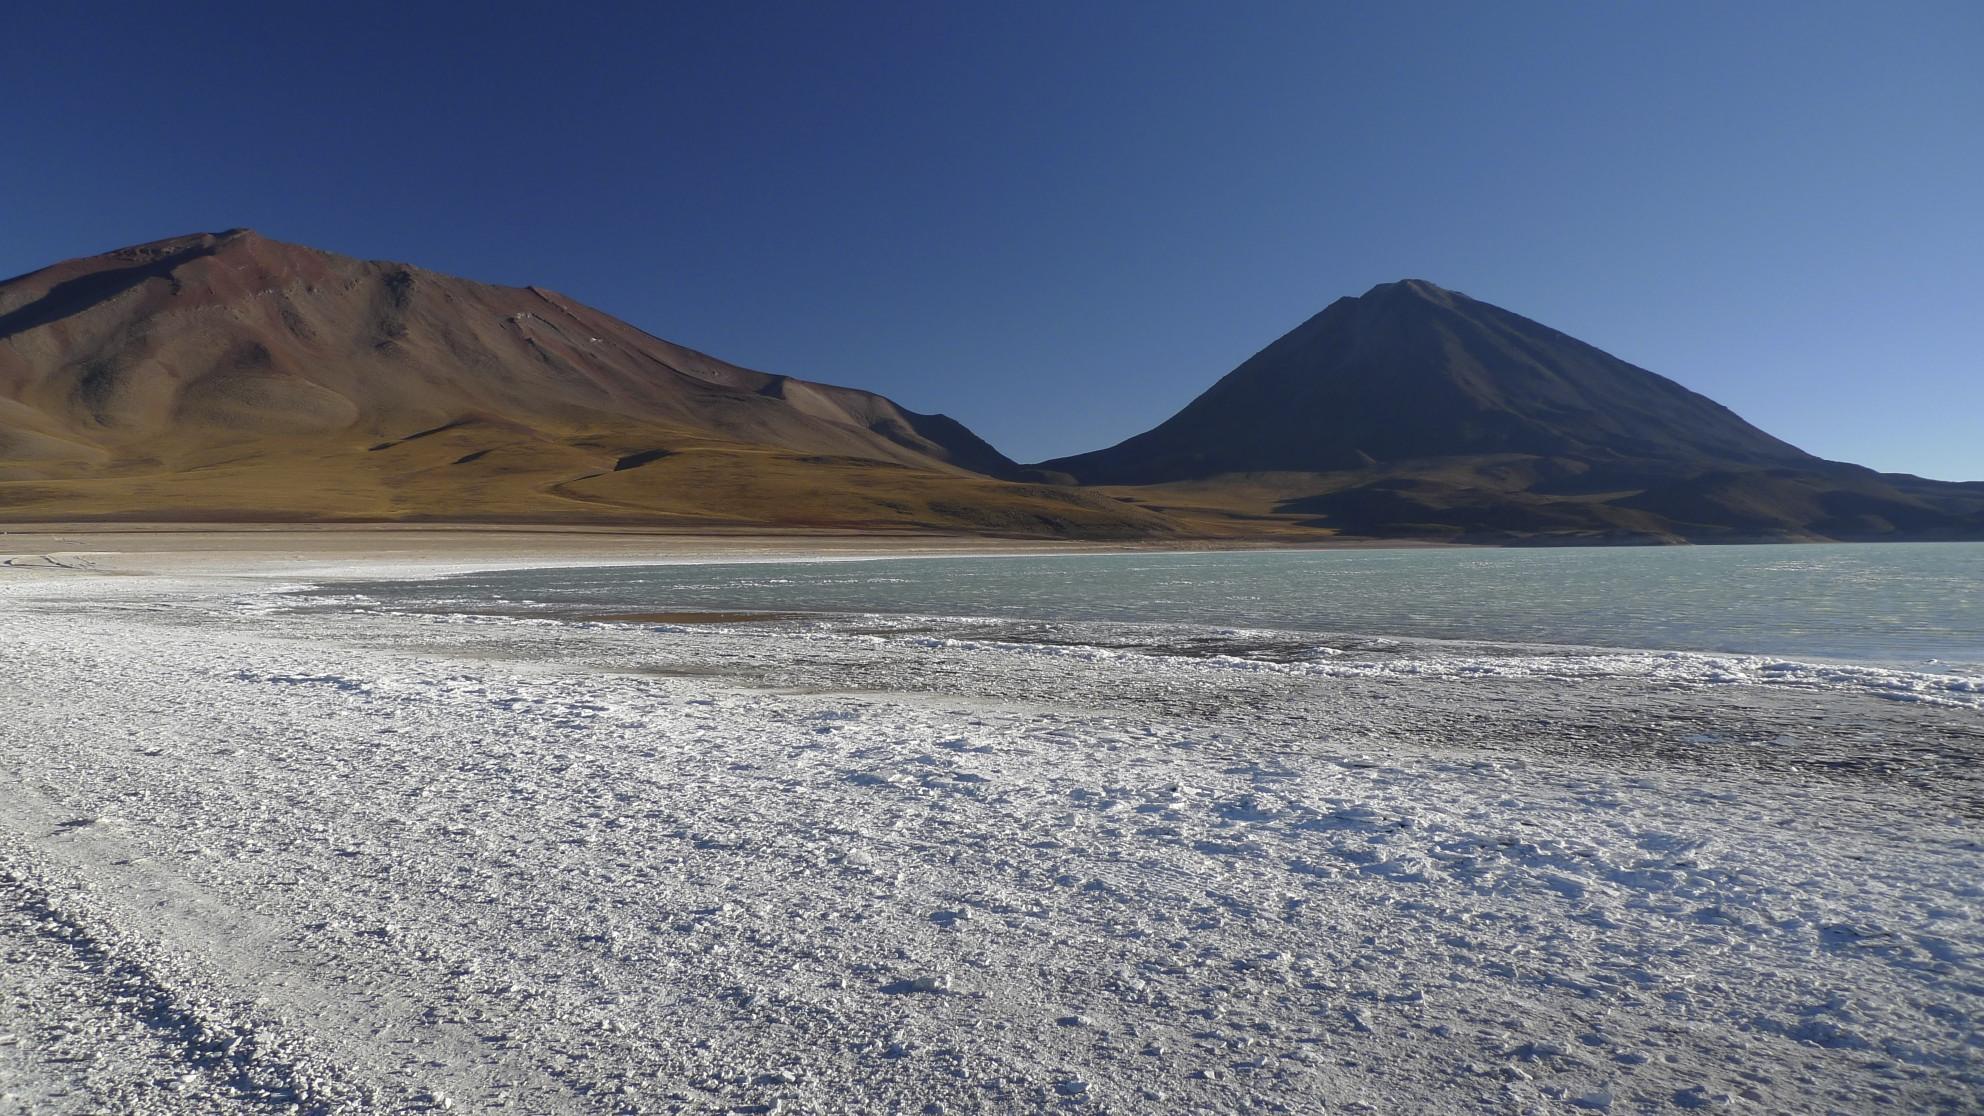 Laguna Verde 4,300m, Volcan Licancabur is on the right. The climb is 1,630m elevation gain.